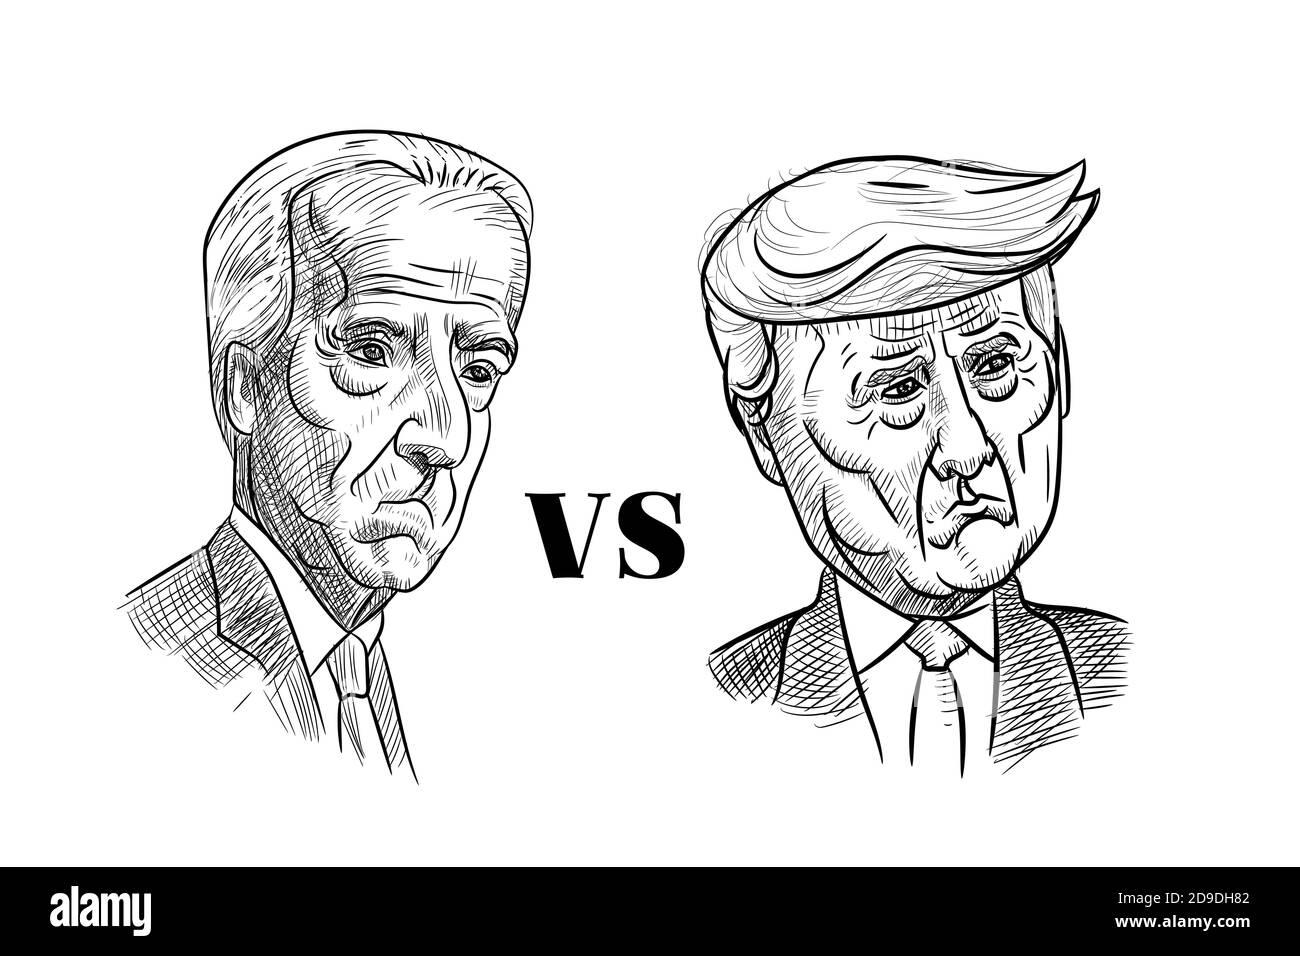 Nov 5, 2020, Bangkok, Thailand: Caricature drawing portrait of Republican Donald Trump vs Democrat Joe Biden, sad face, for American President Electio Stock Vector